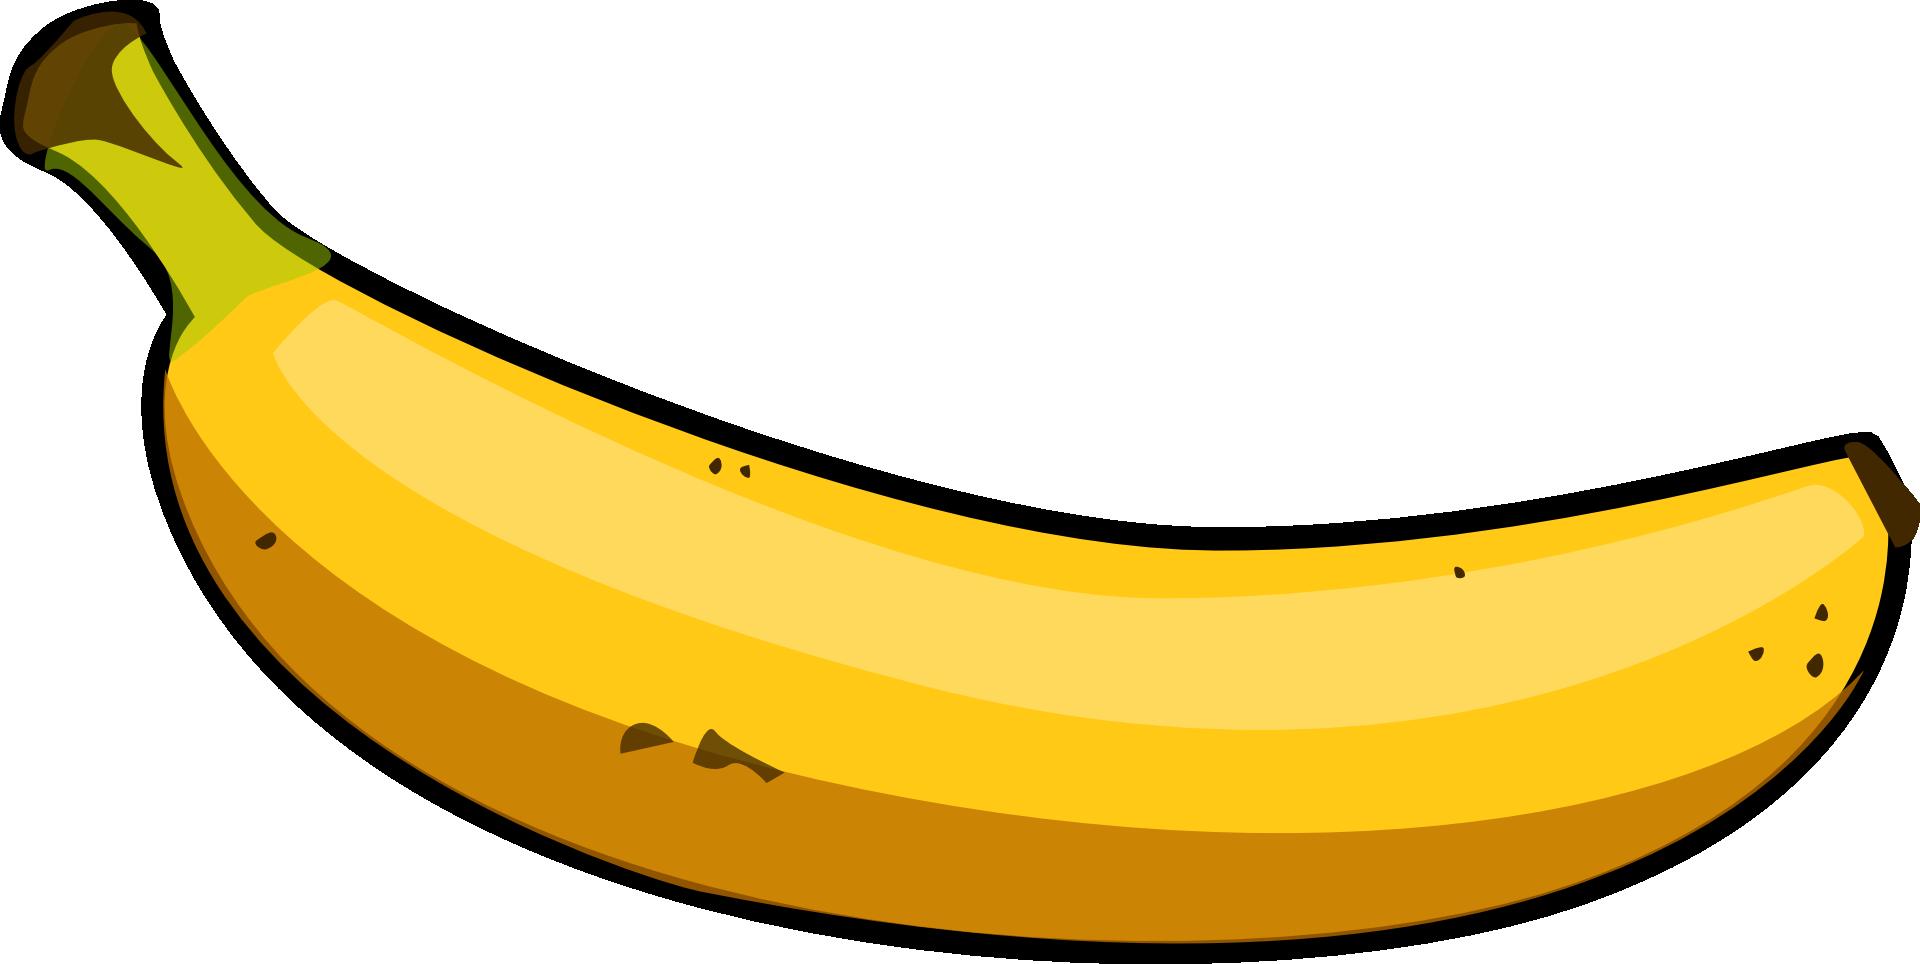 Banana clipart bananaclipart fruit clip art Banana Clipartclipart org